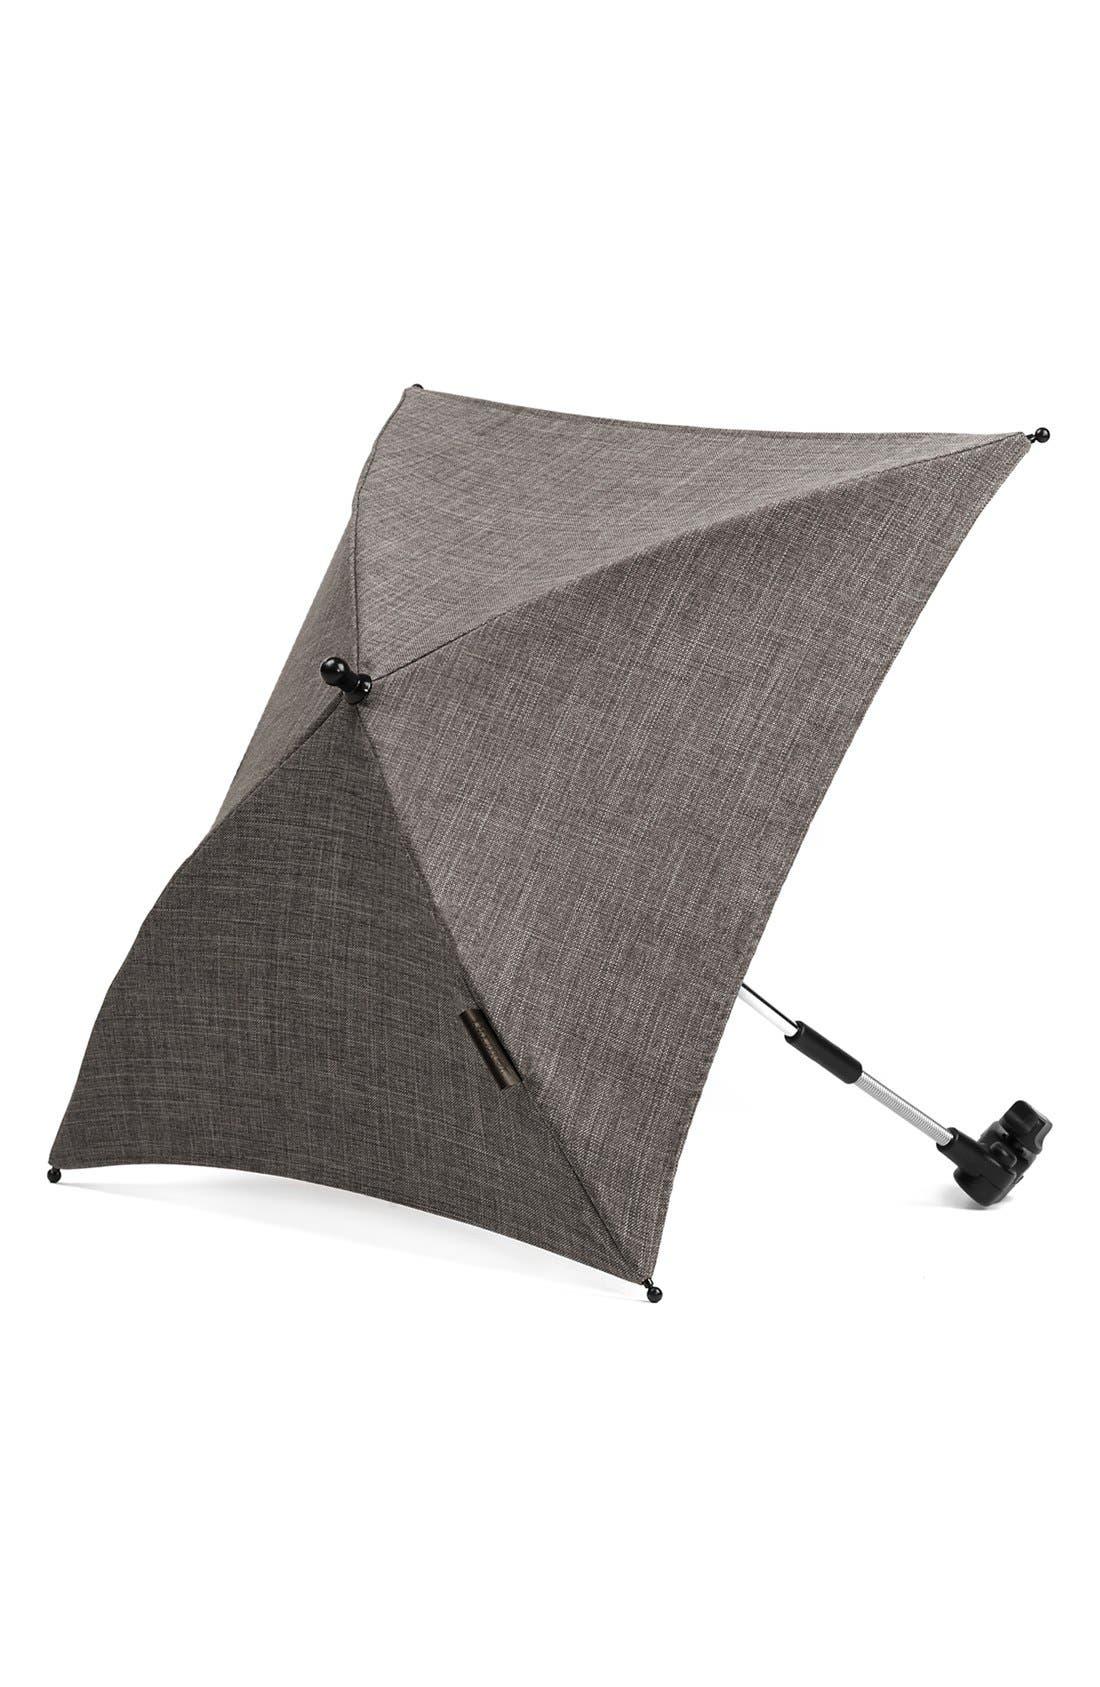 Main Image - Mutsy 'Evo - Famer Earth' Stroller Umbrella